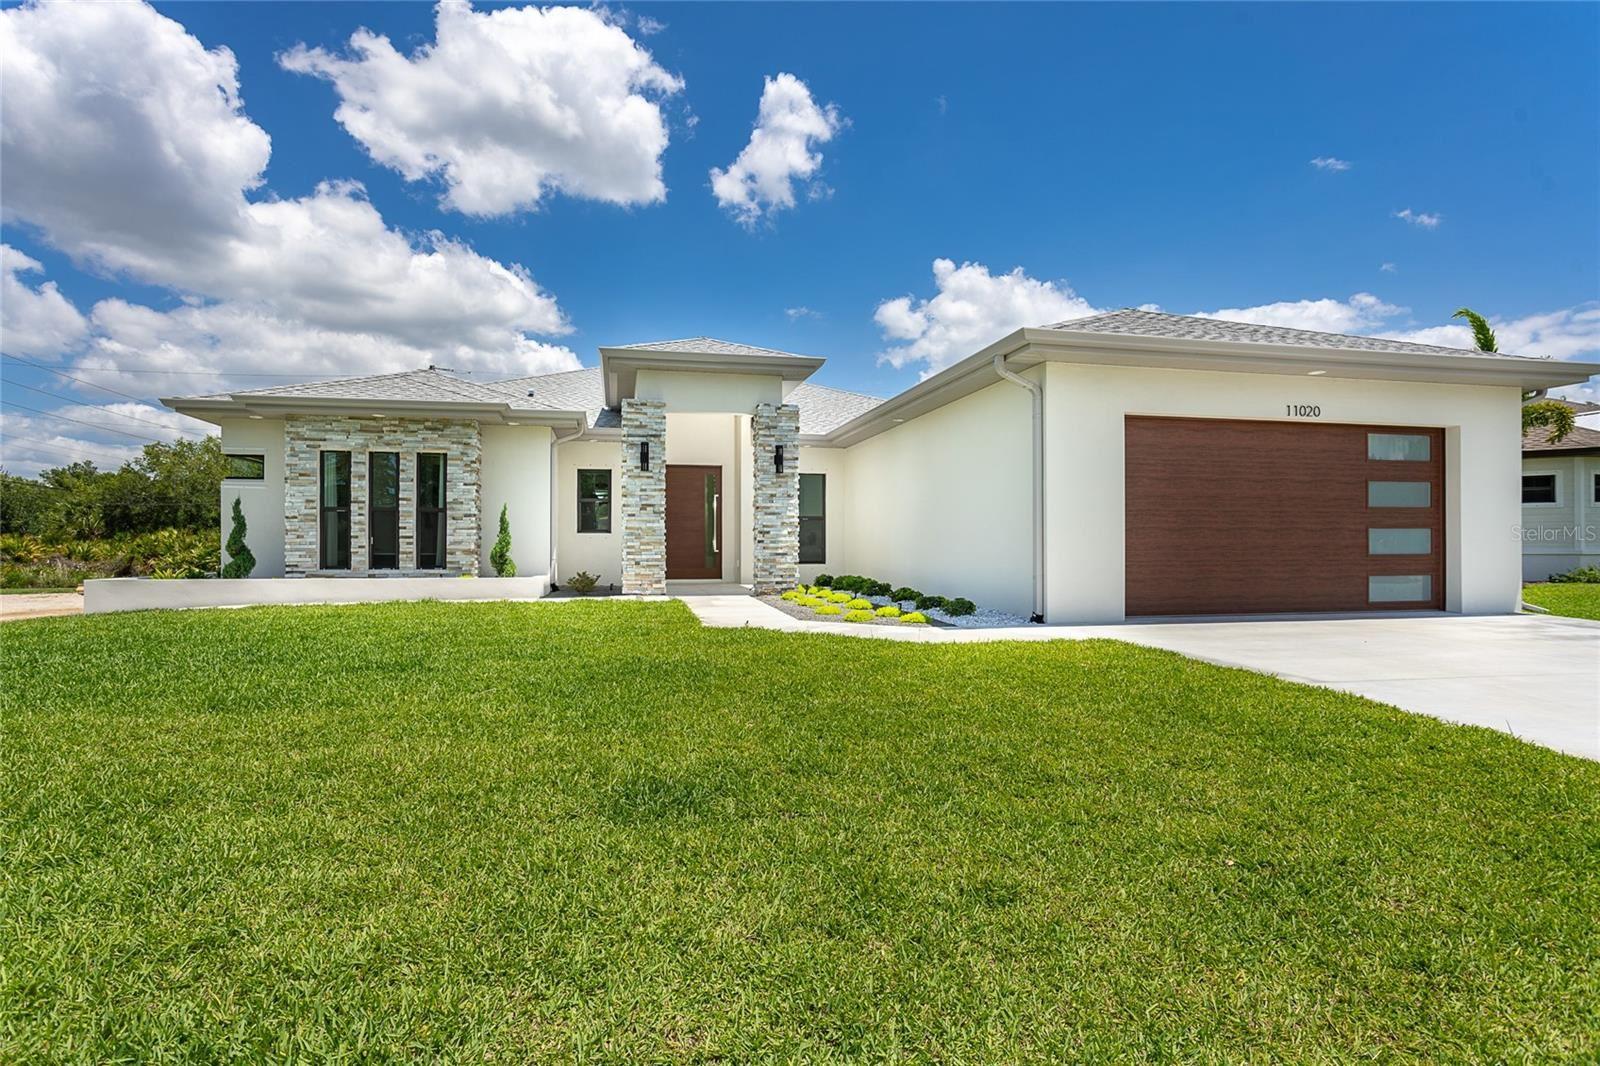 11020 SUNNYDALE AVENUE, Englewood, FL 34224 - MLS#: D6119061